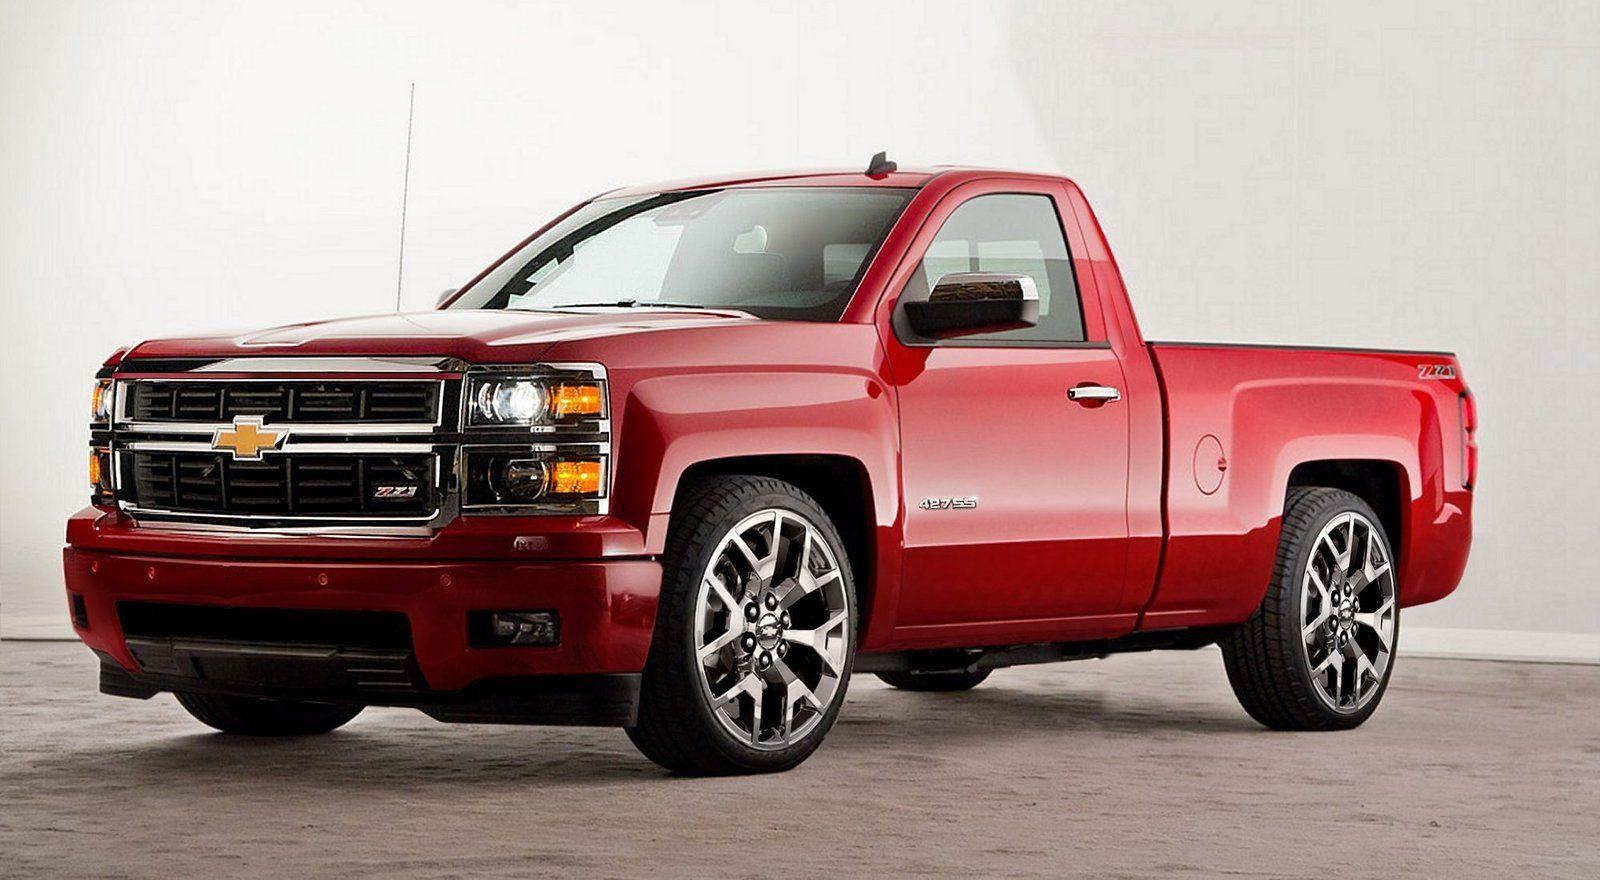 All Chevy chevy 1500 weight : 2014 #Chevy #Silverado | Chevy Trucks | Pinterest | 2014 chevy ...